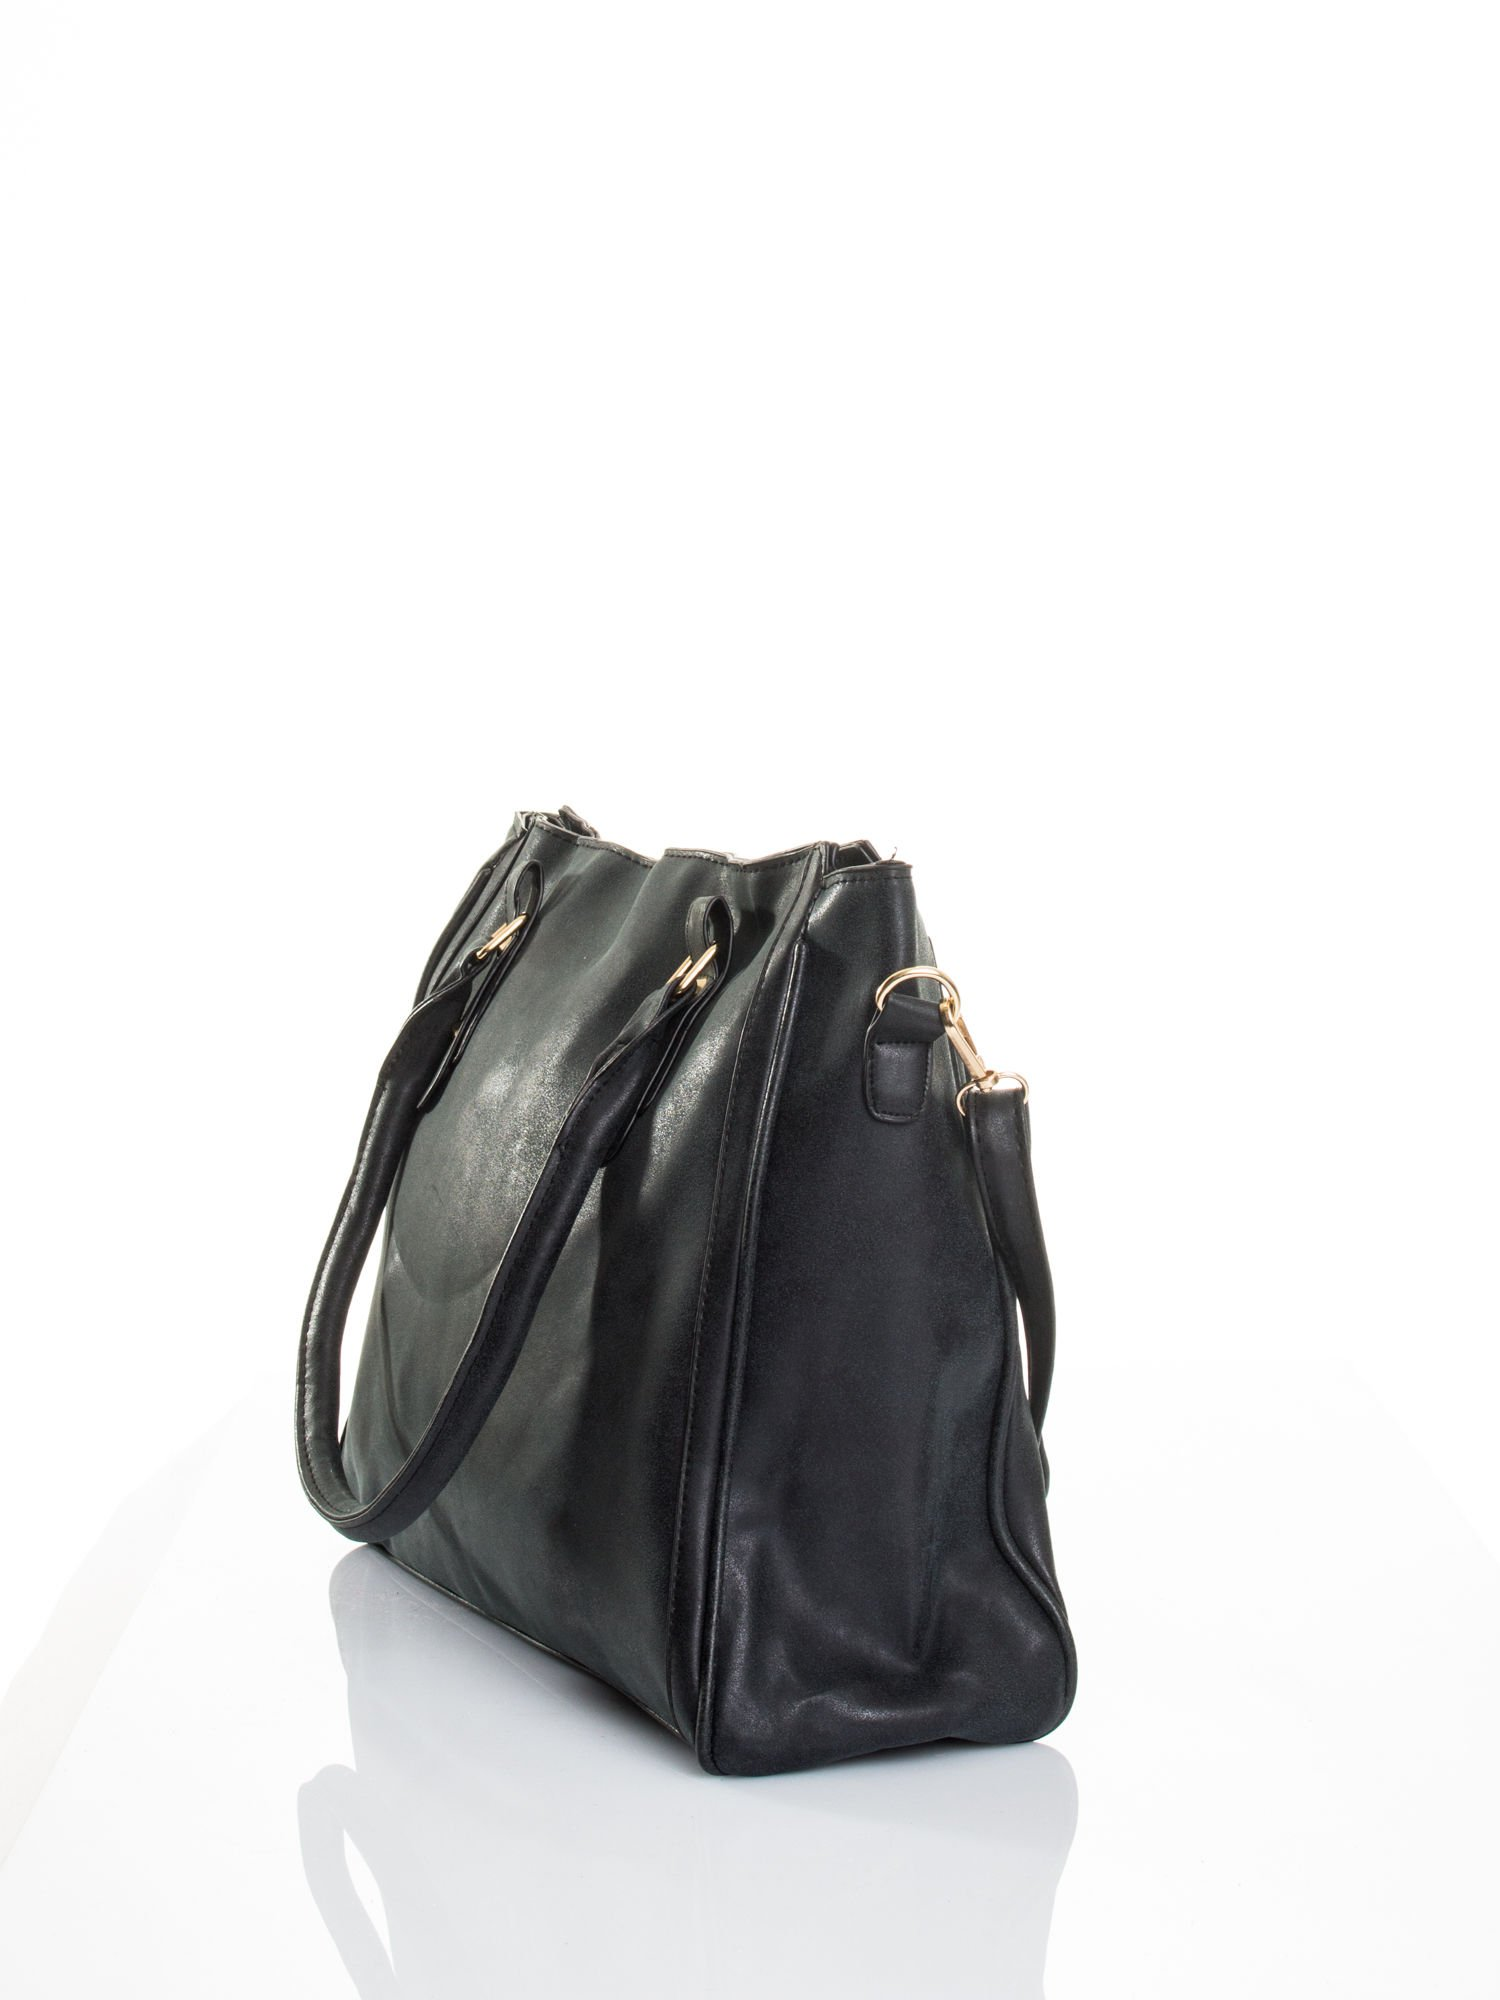 Czarna torebka miejska                                  zdj.                                  3